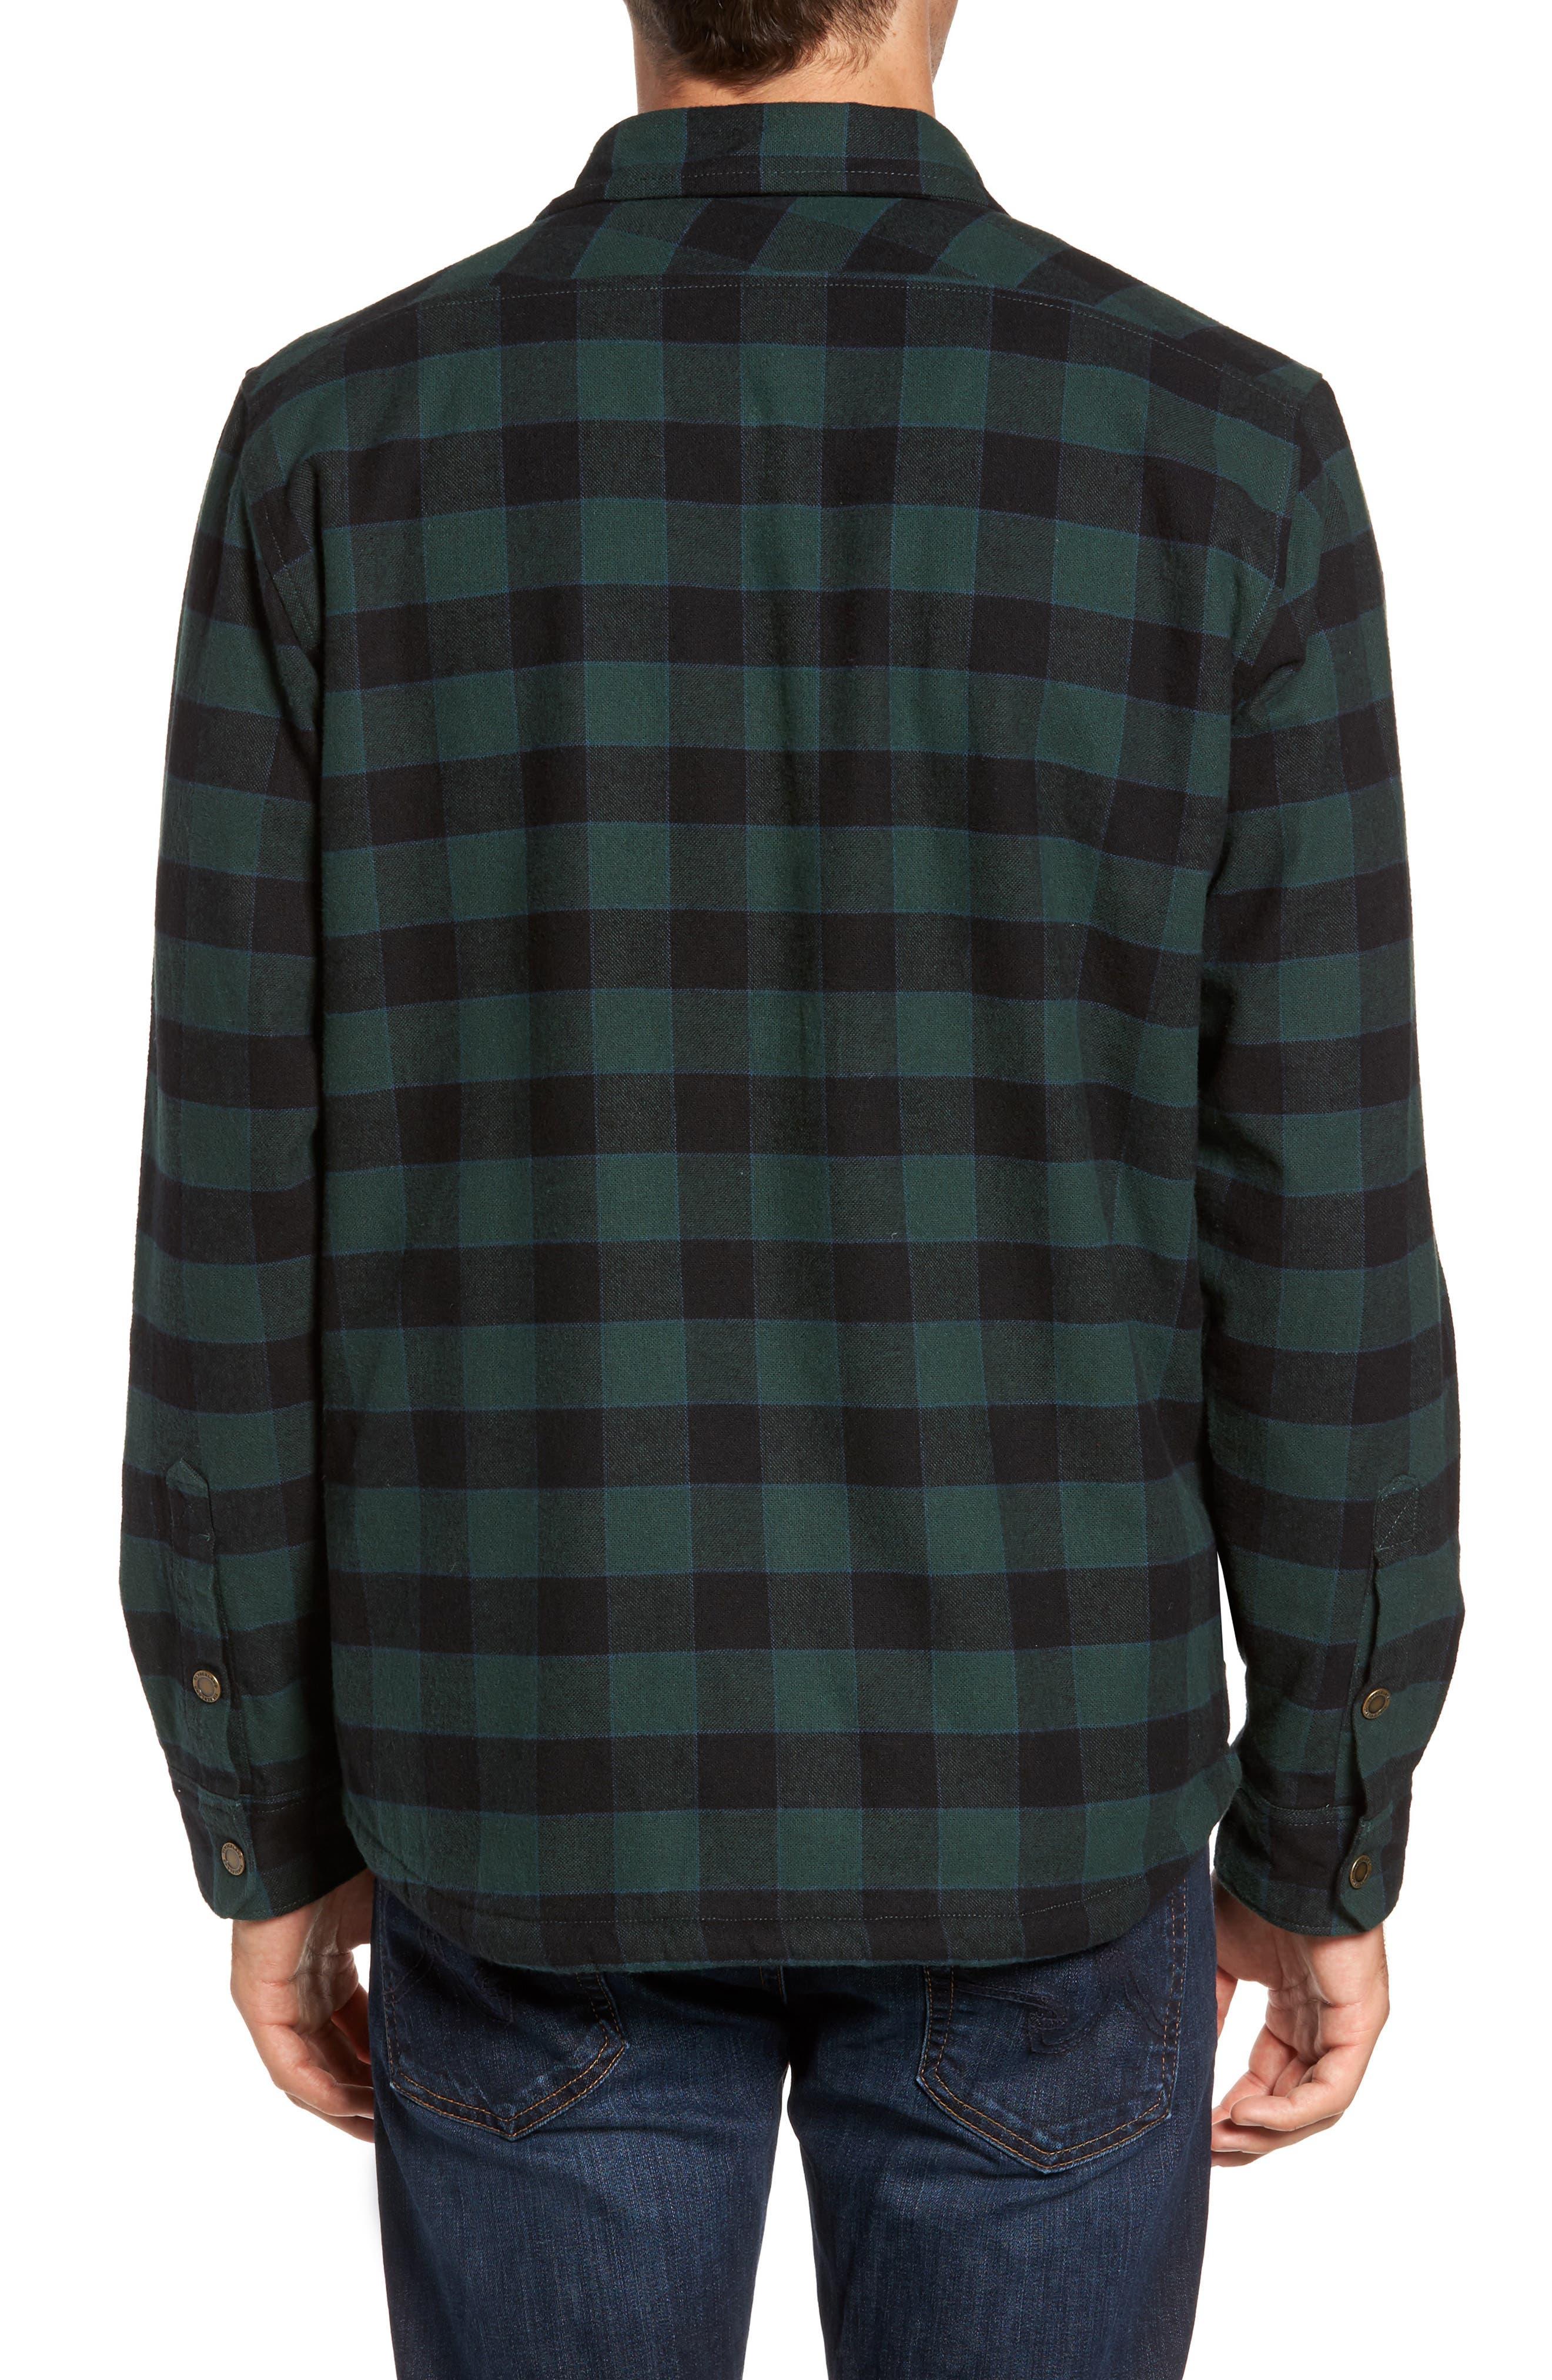 Check Shirt Jacket with Faux Shearling Lining,                             Alternate thumbnail 2, color,                             301